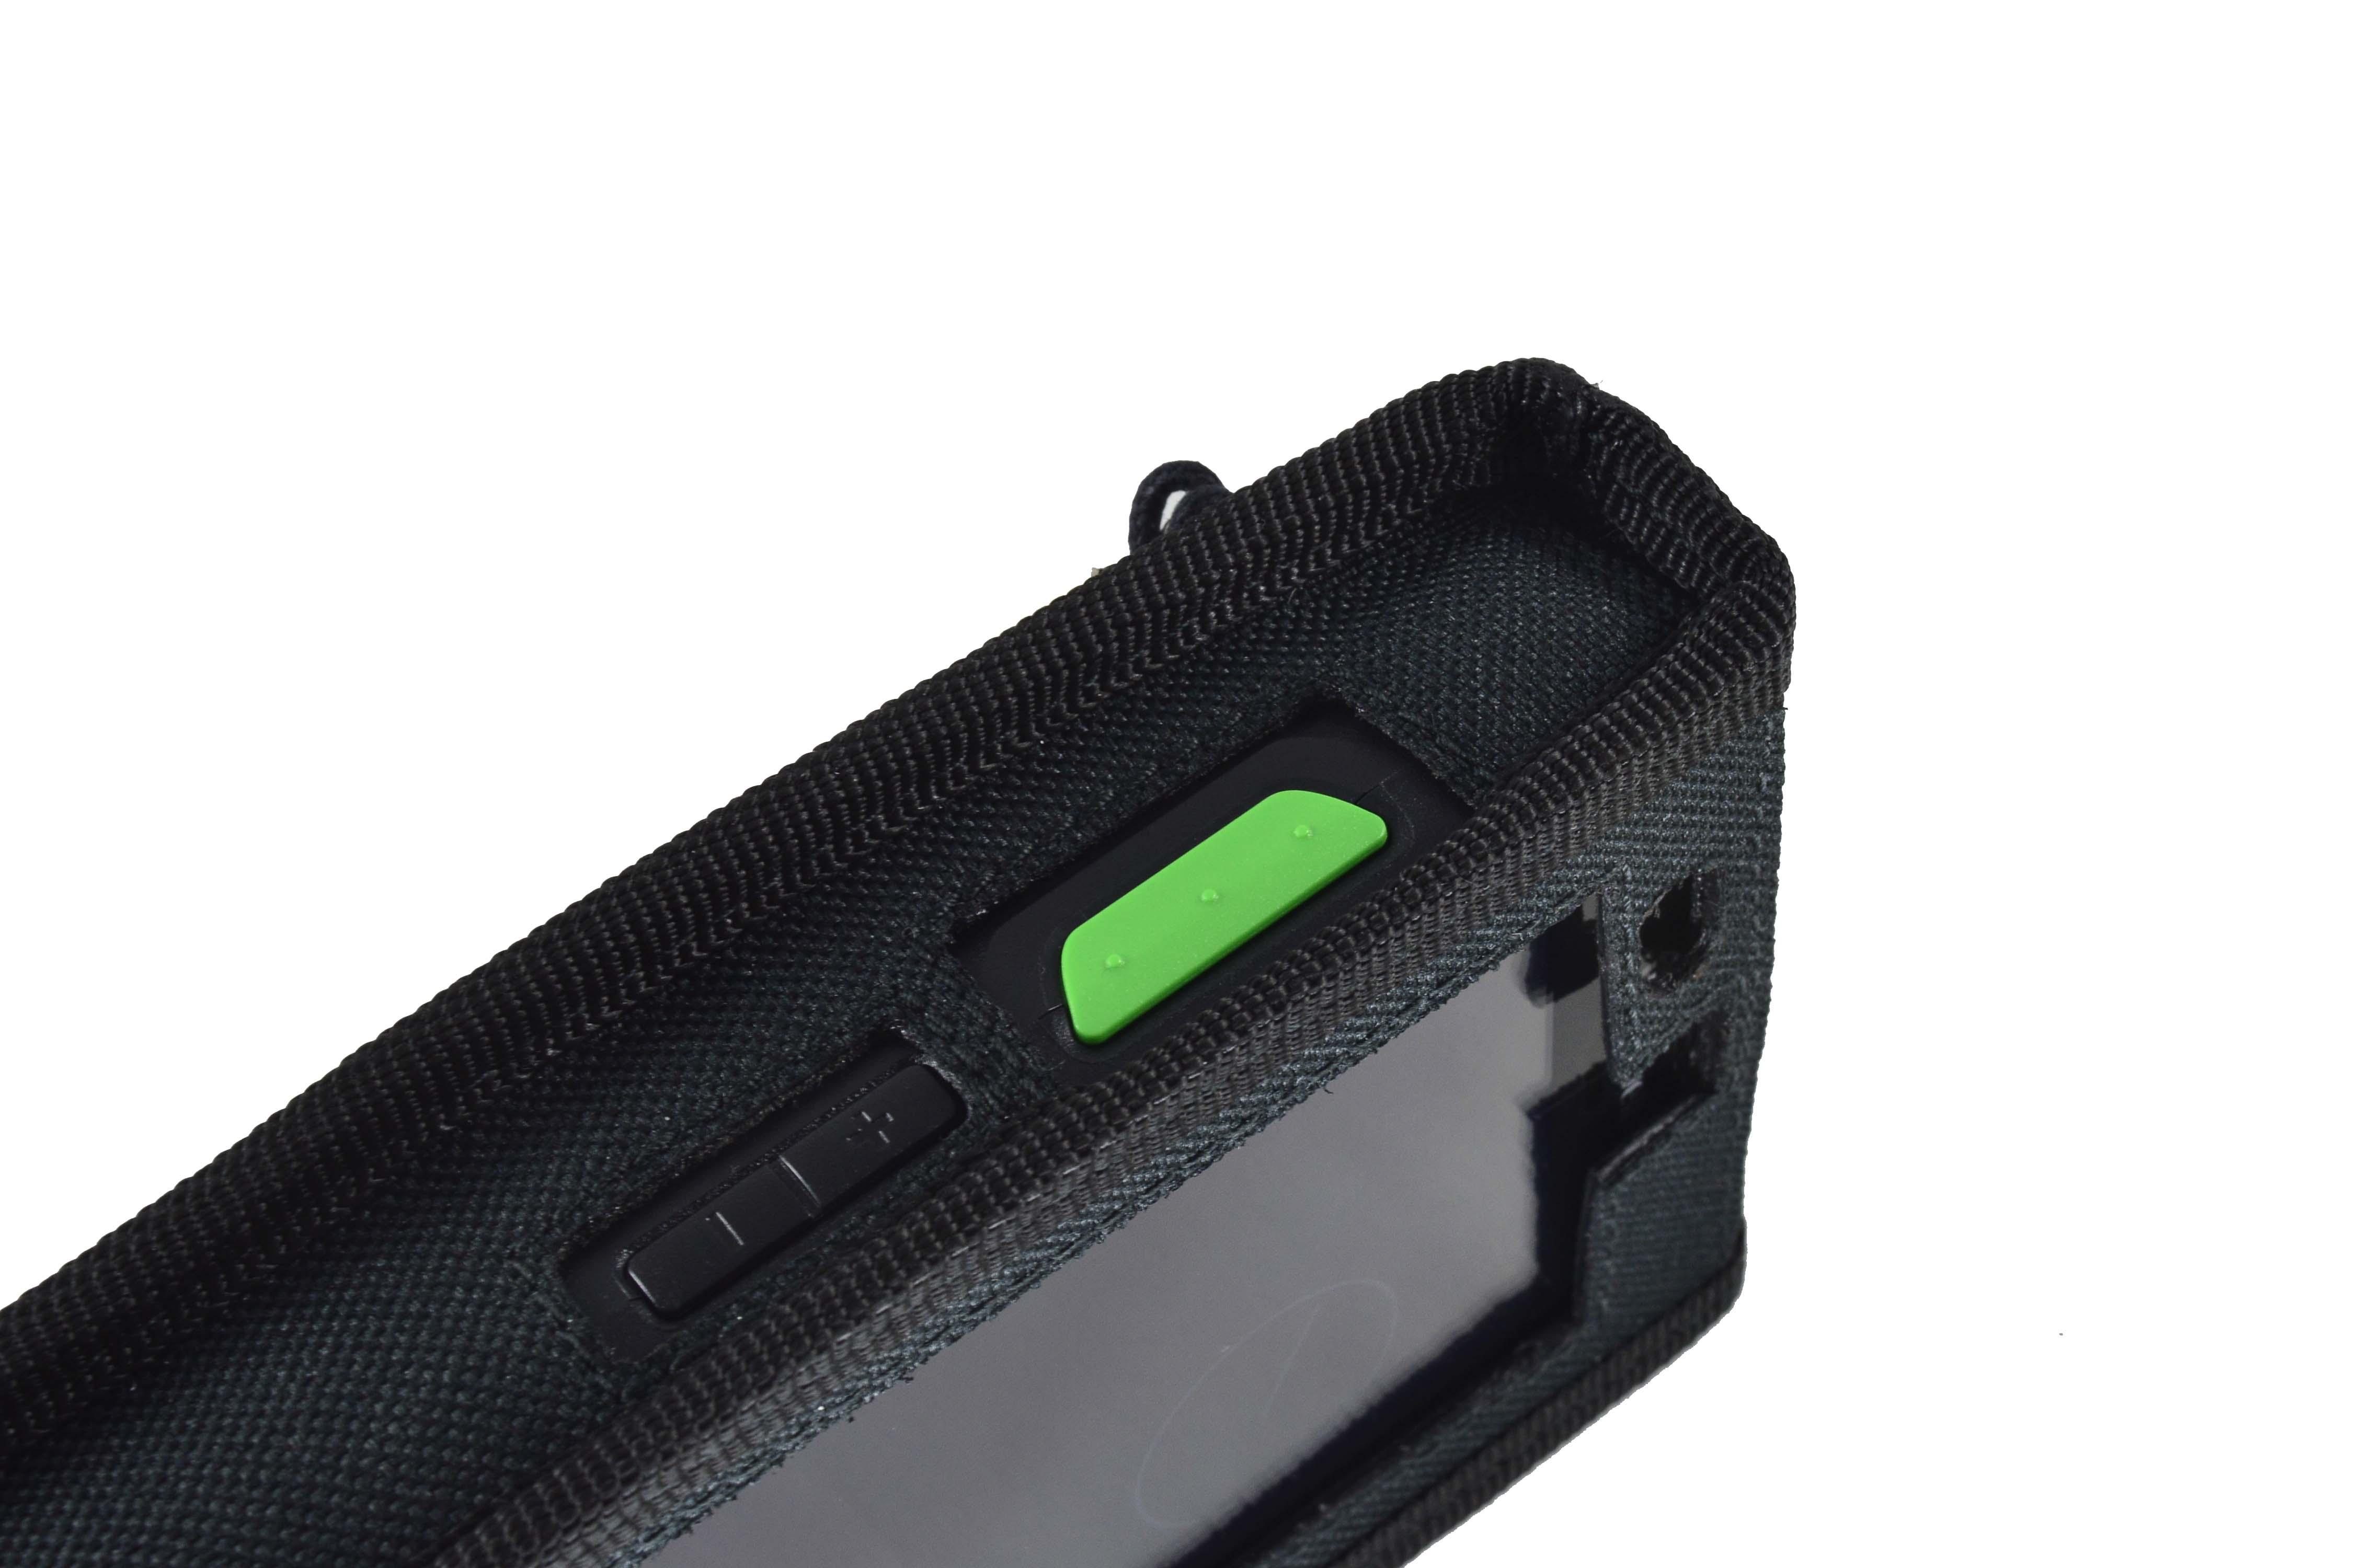 Honeywell ScanPal EDA 50K case left side detail